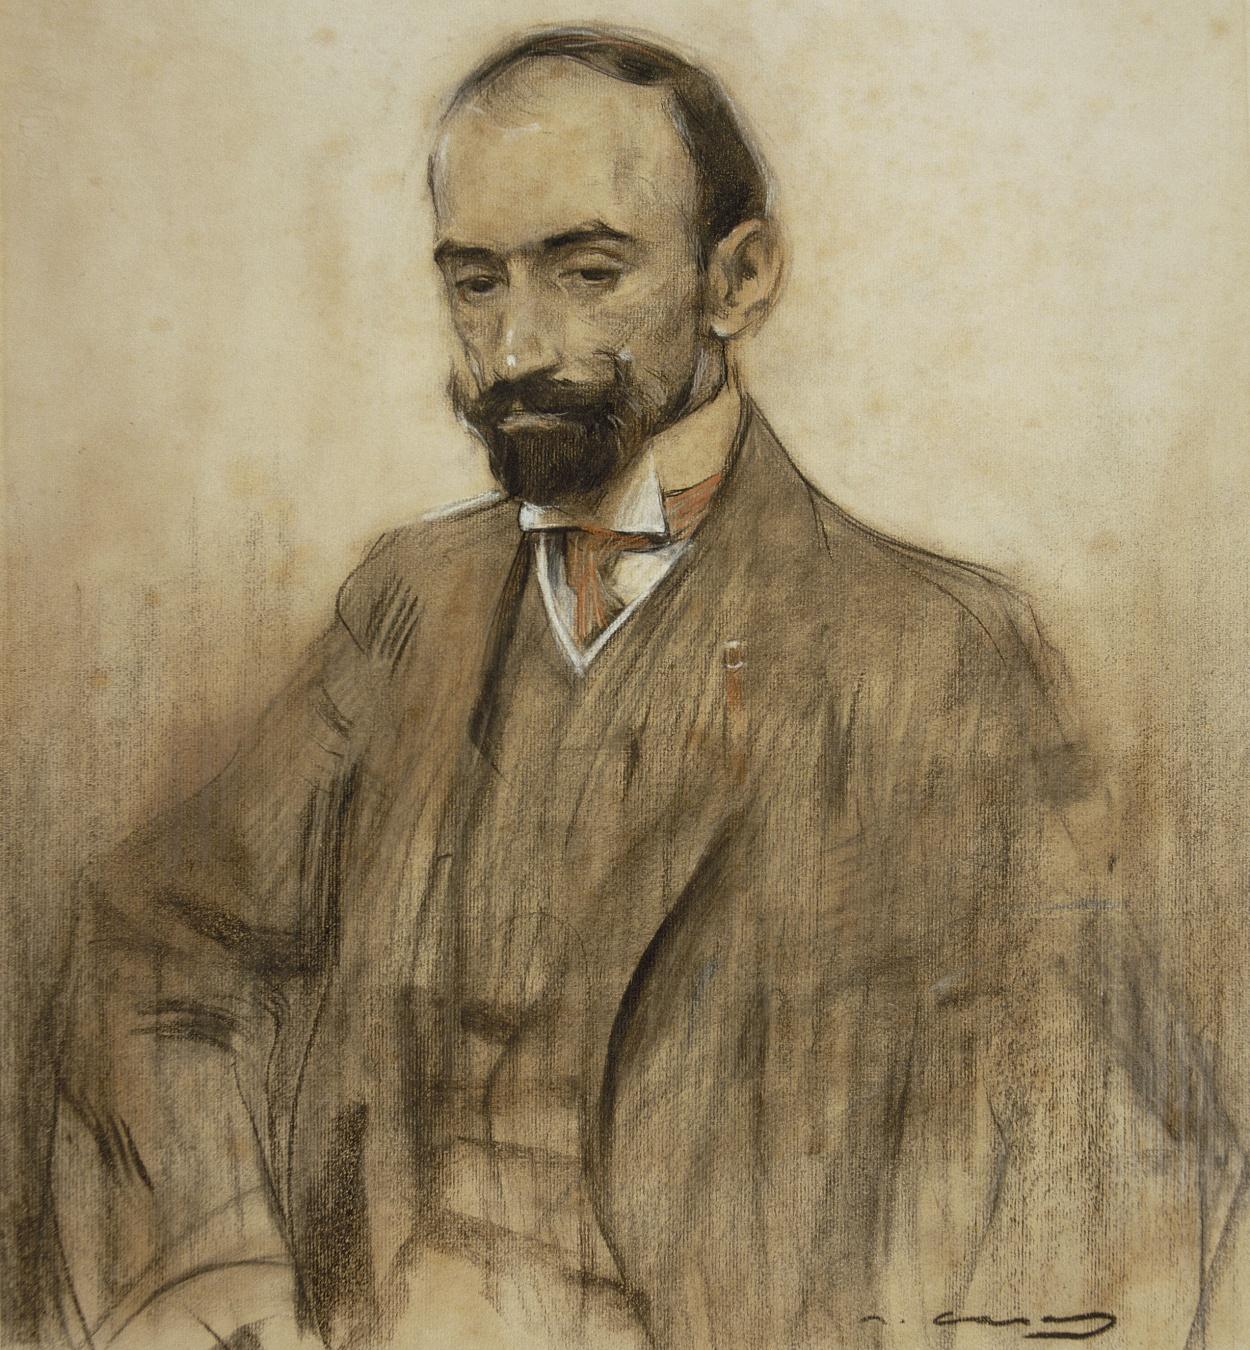 Ramon Casas - Retrato de Jacinto Benavente - Hacia 1904-1905